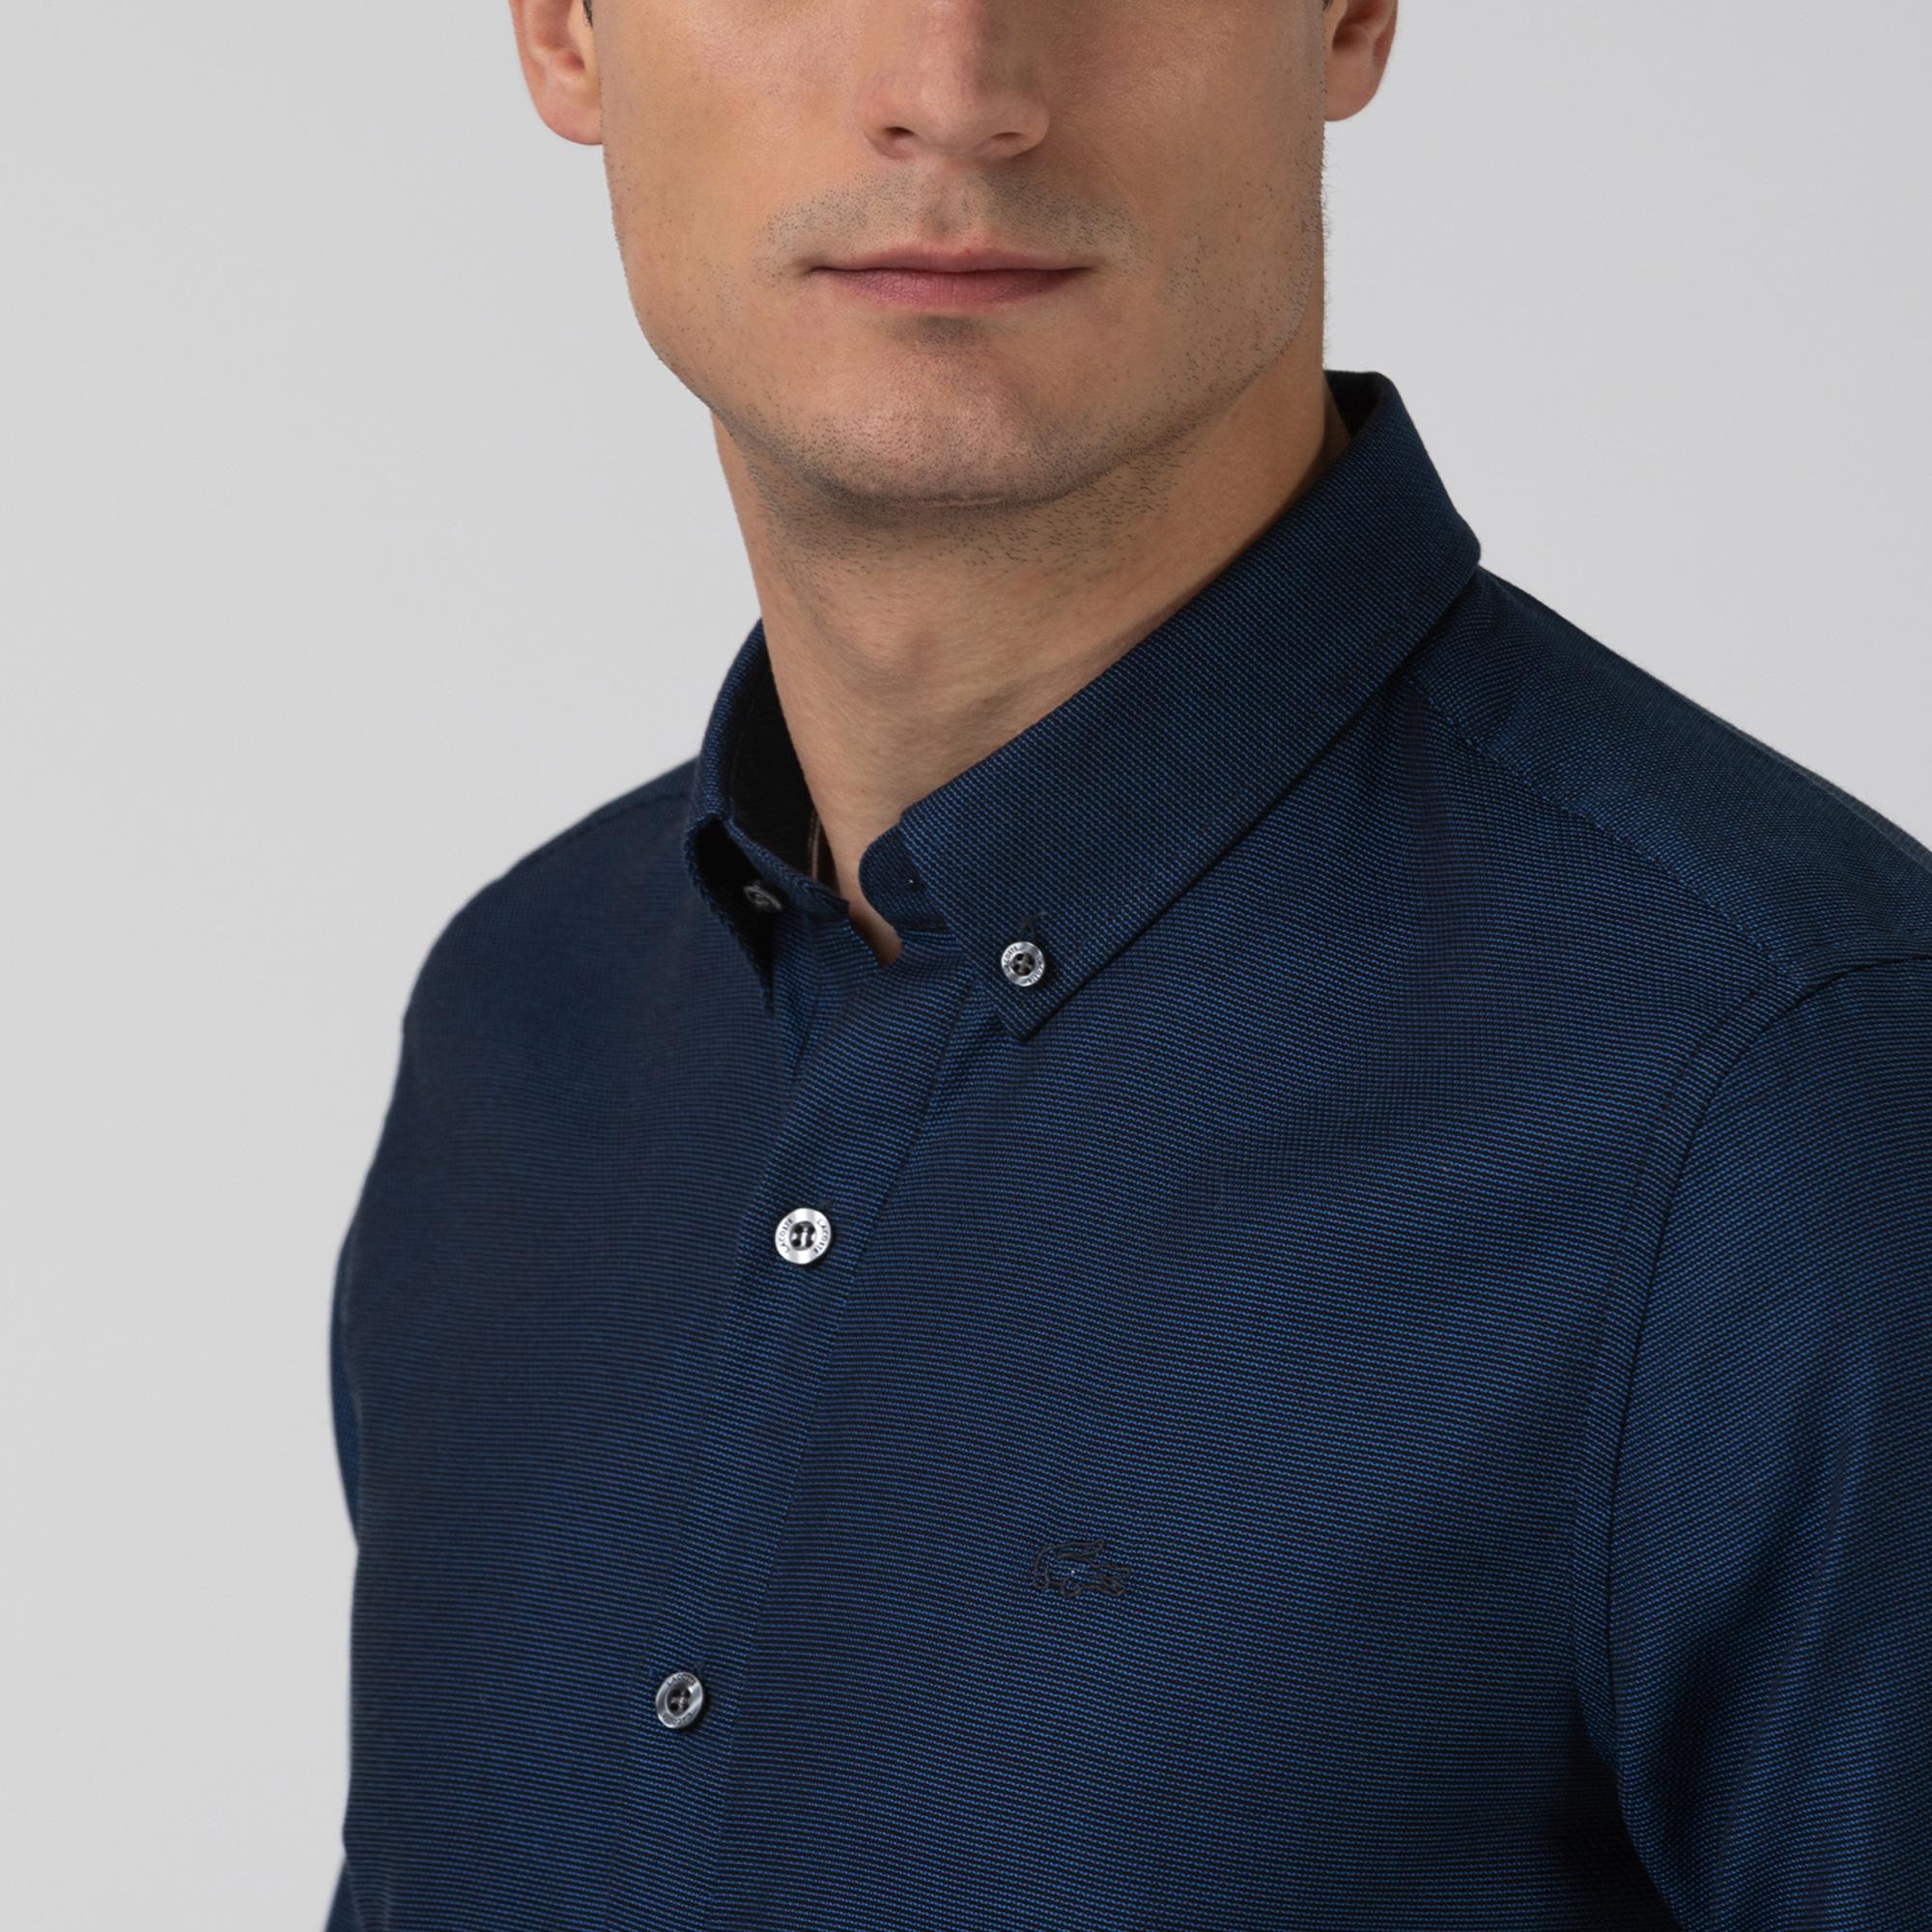 Lacoste Erkek Slim Fit Lacivert Gömlek